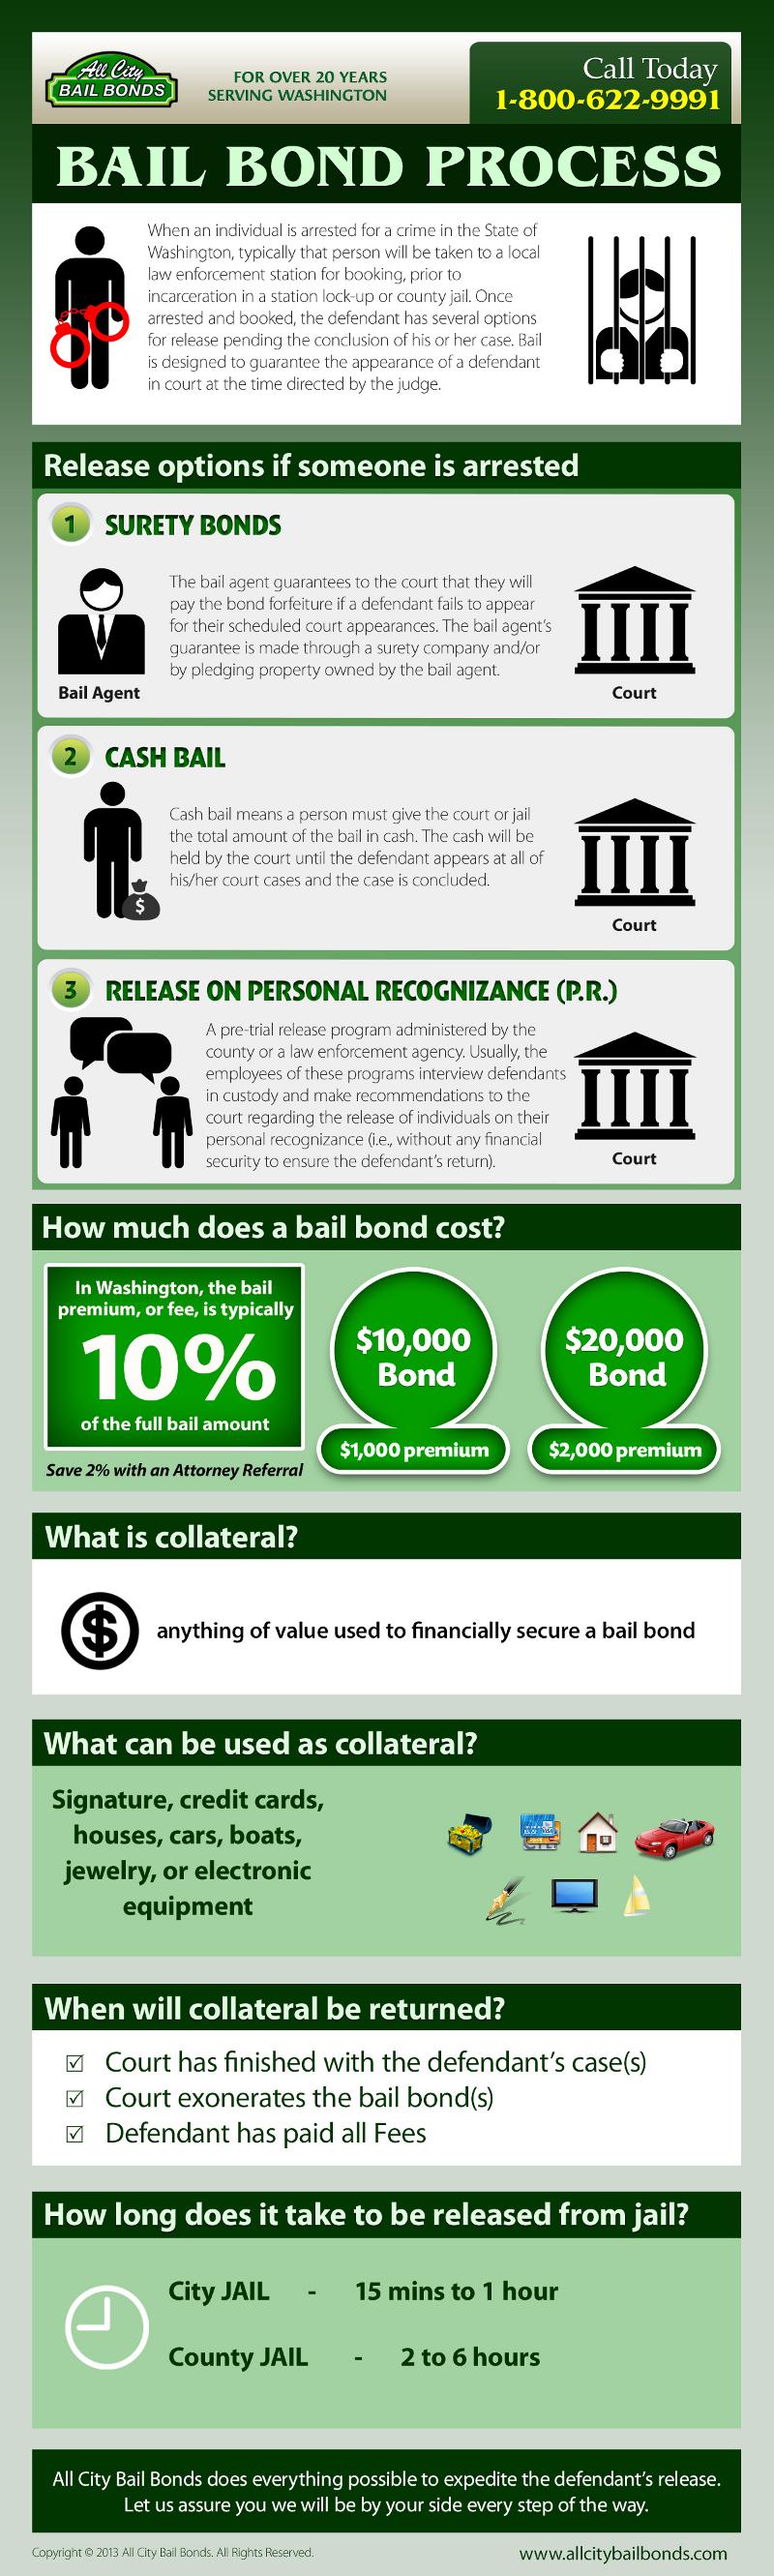 Bail Bonds Explained